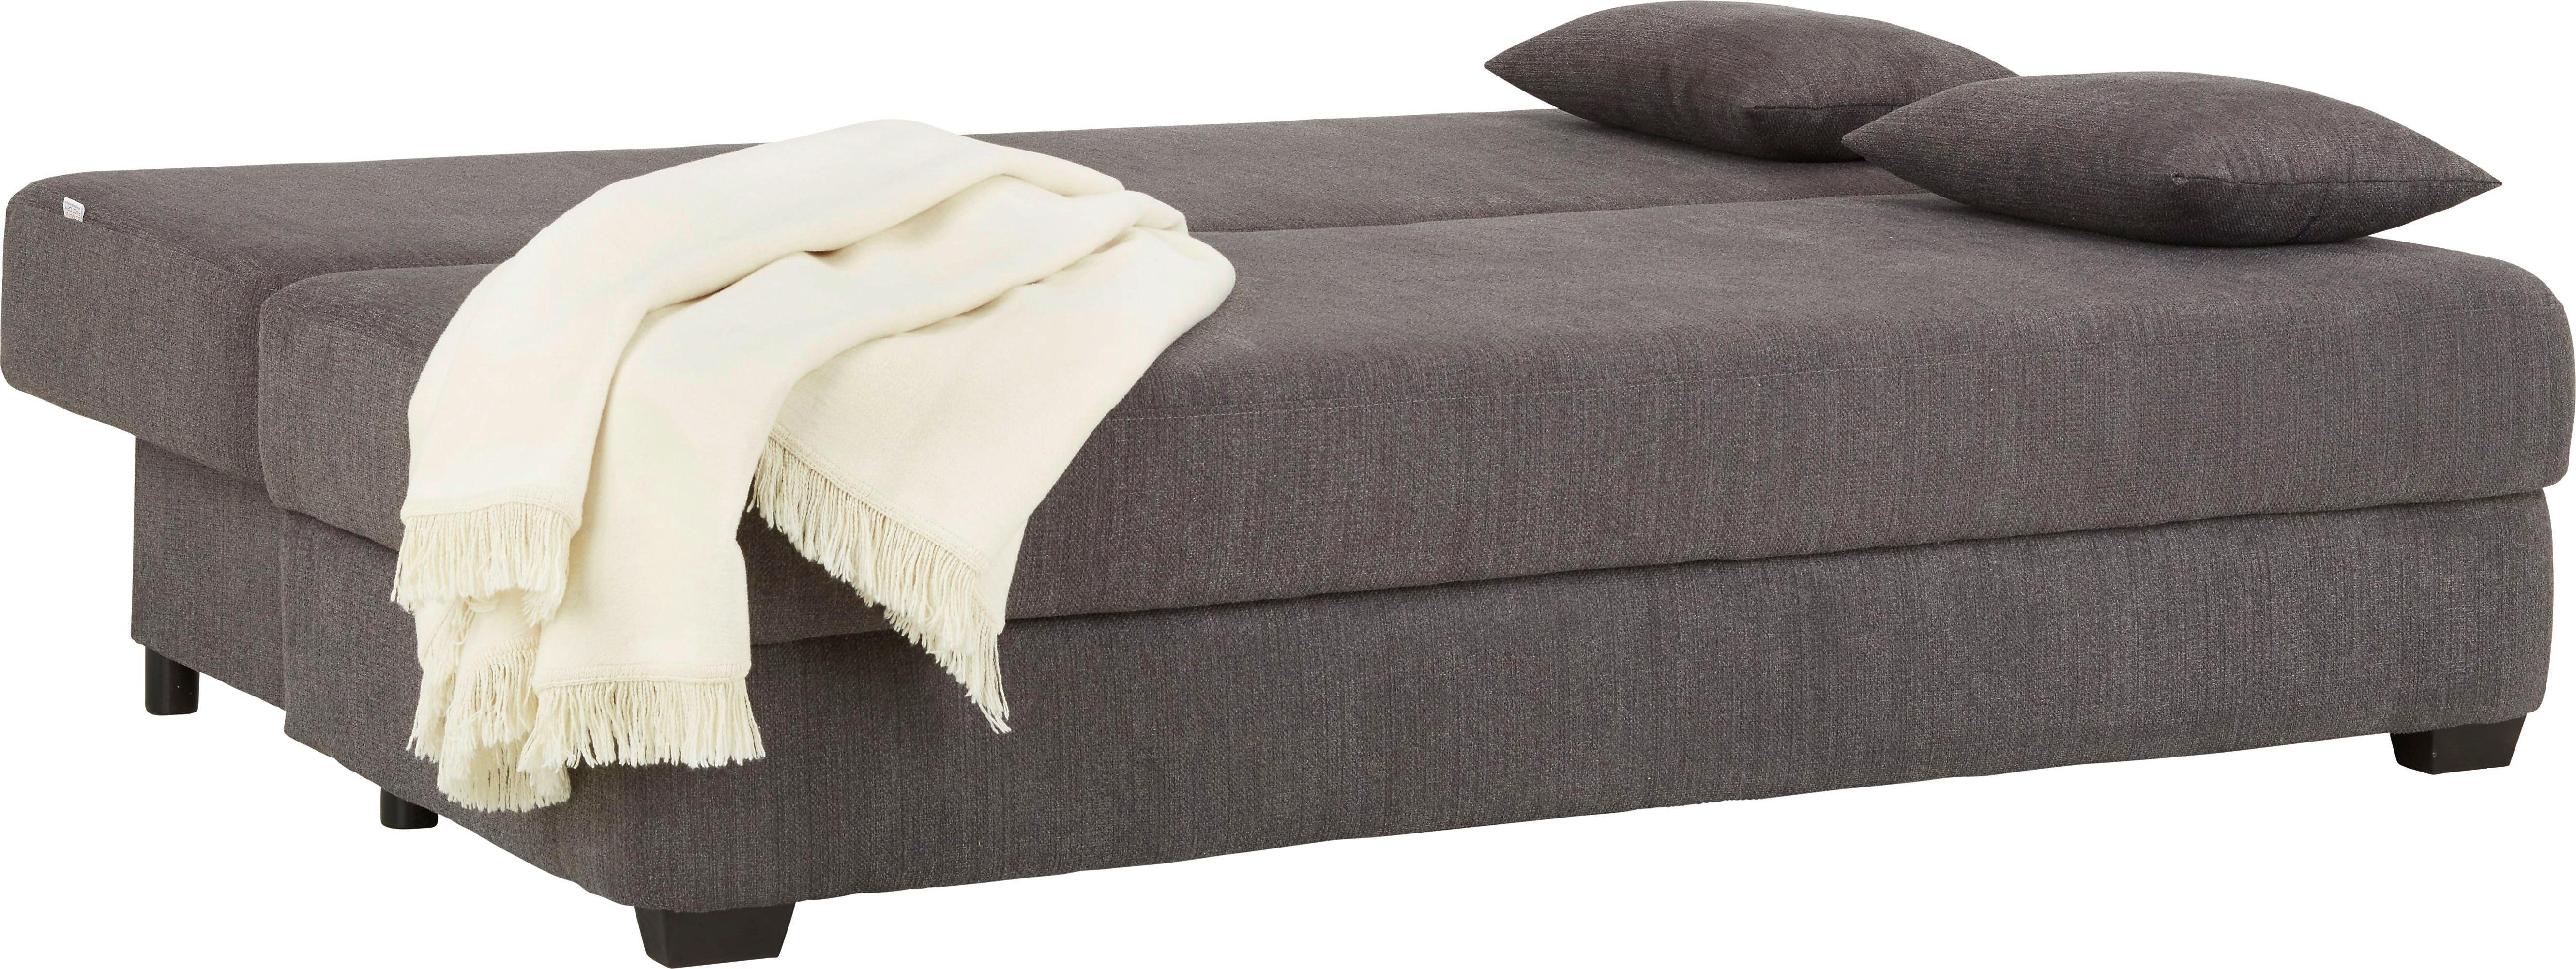 Sofa in Grau mit Kissen - Dunkelbraun/Grau, MODERN, Textil (195/75/100cm) - MODERN LIVING